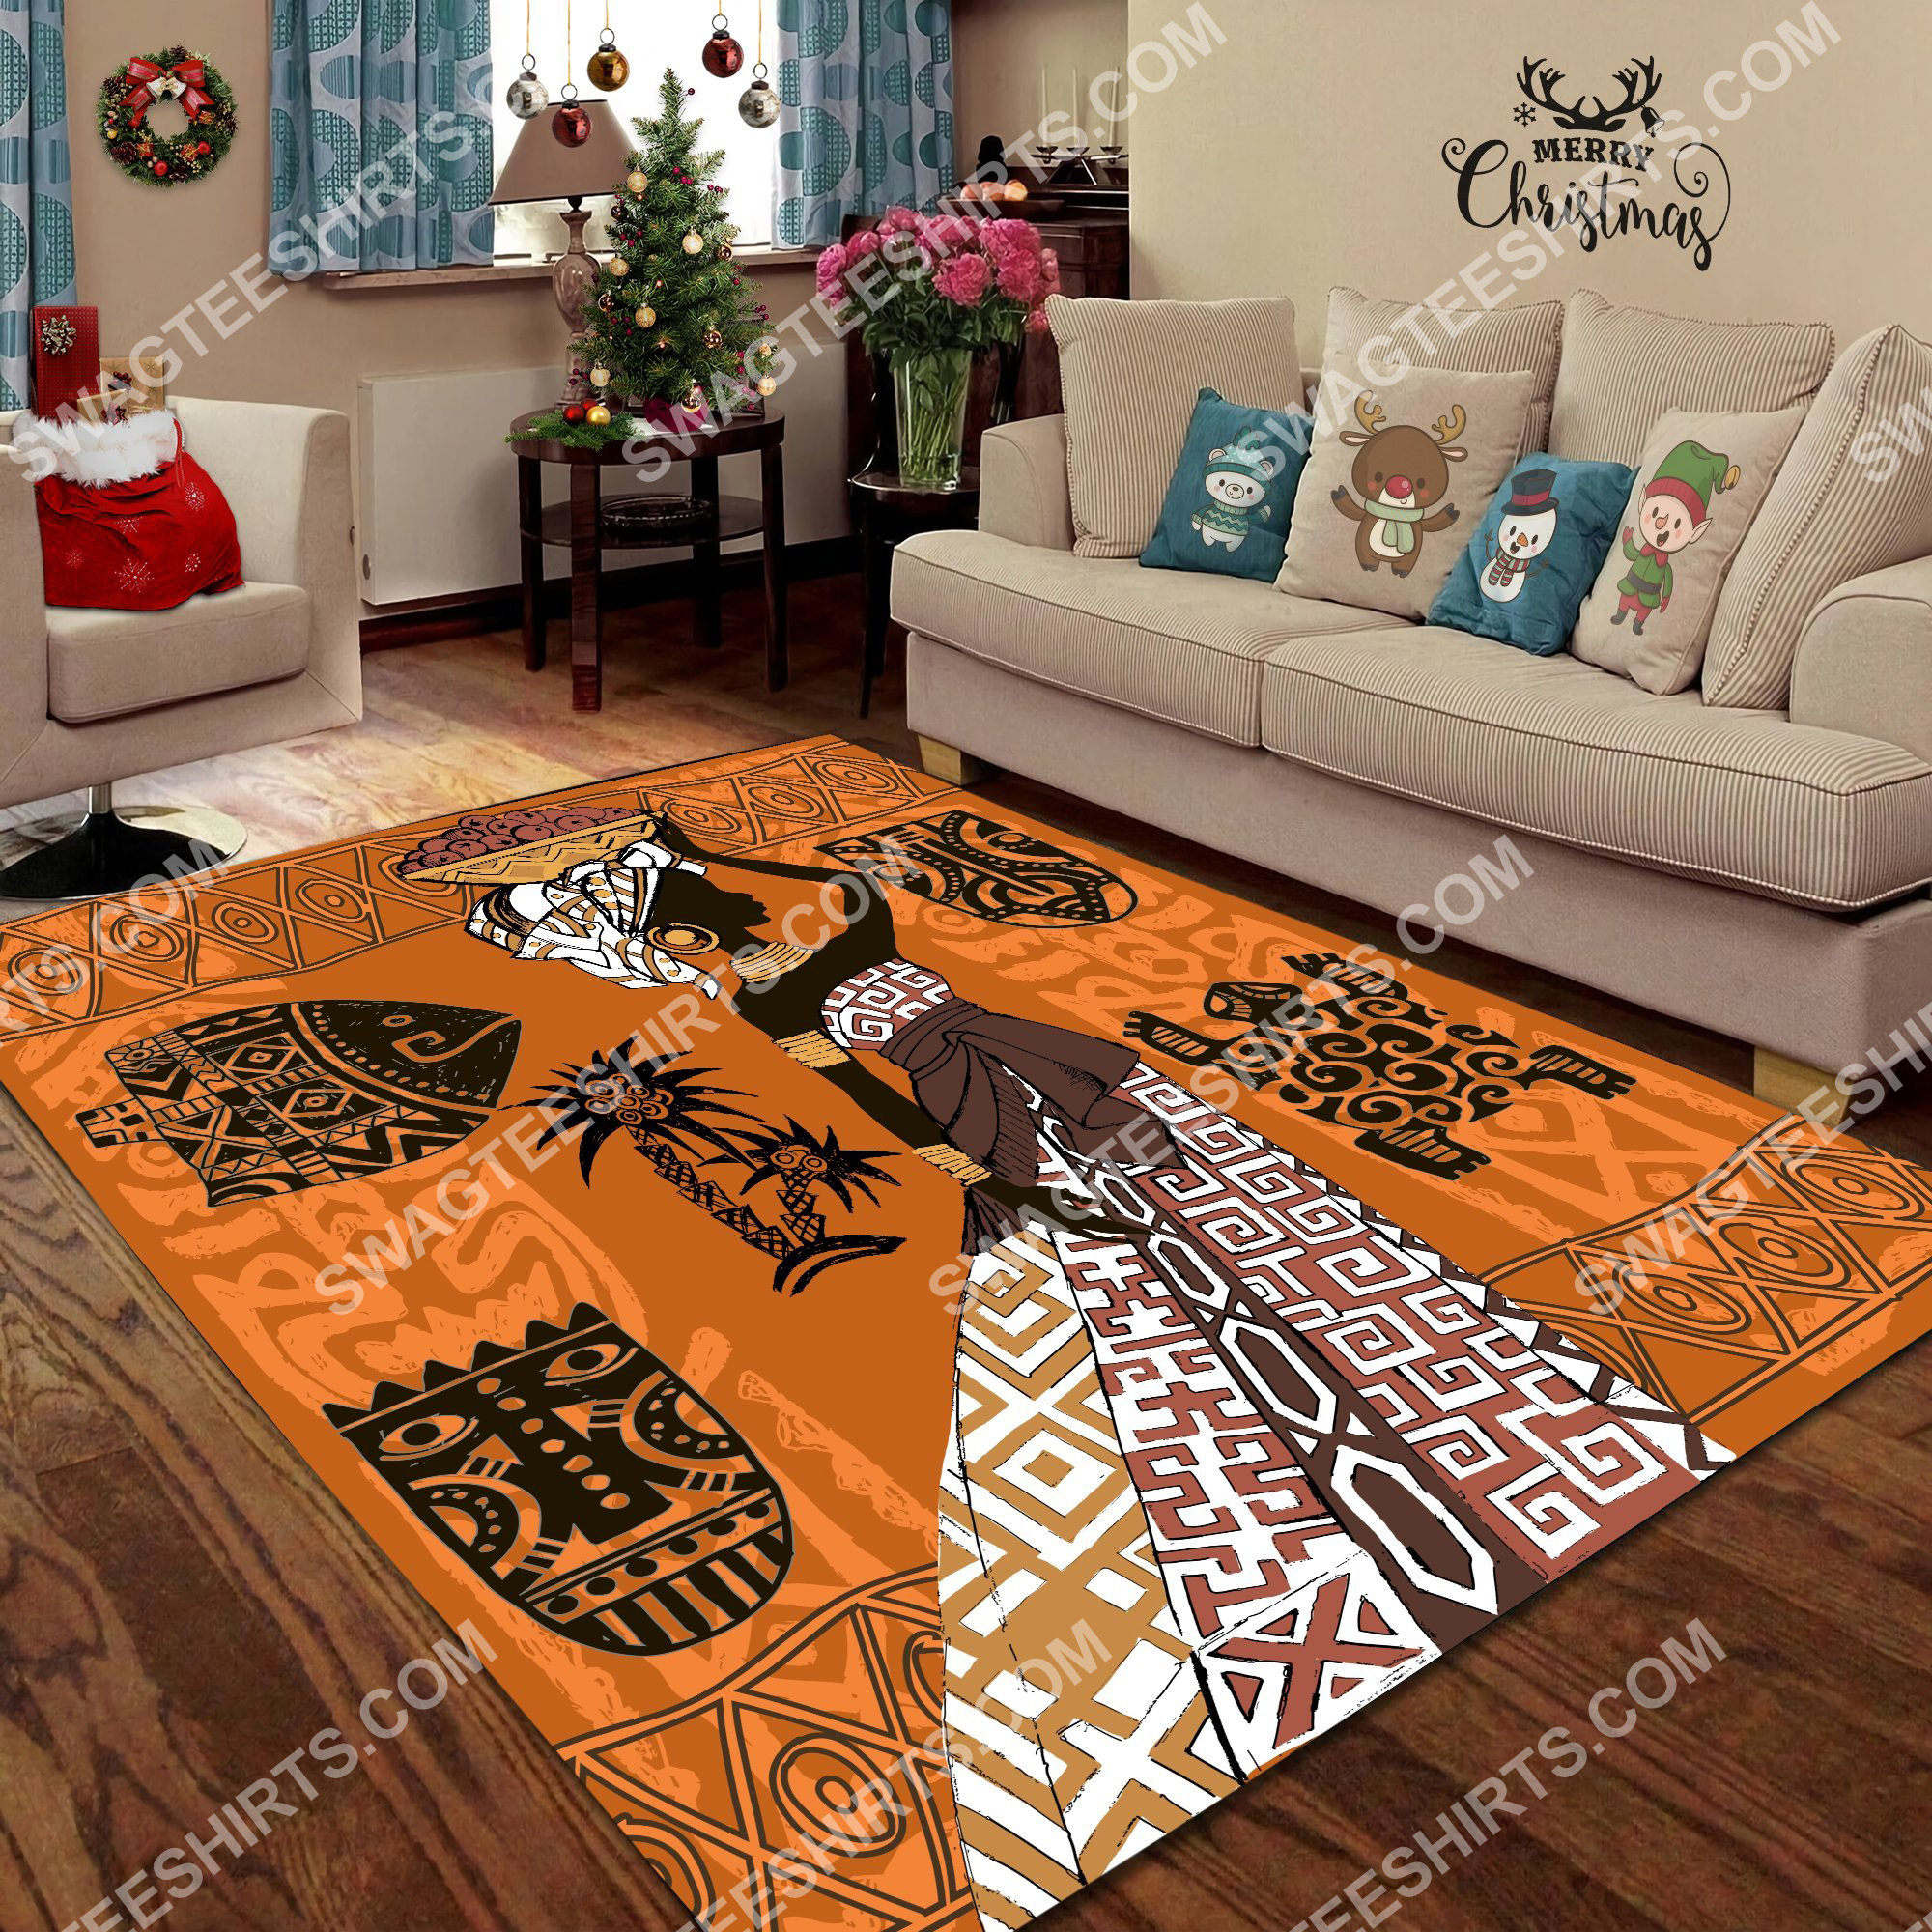 africa lady vintage all over printed rug 2(1)